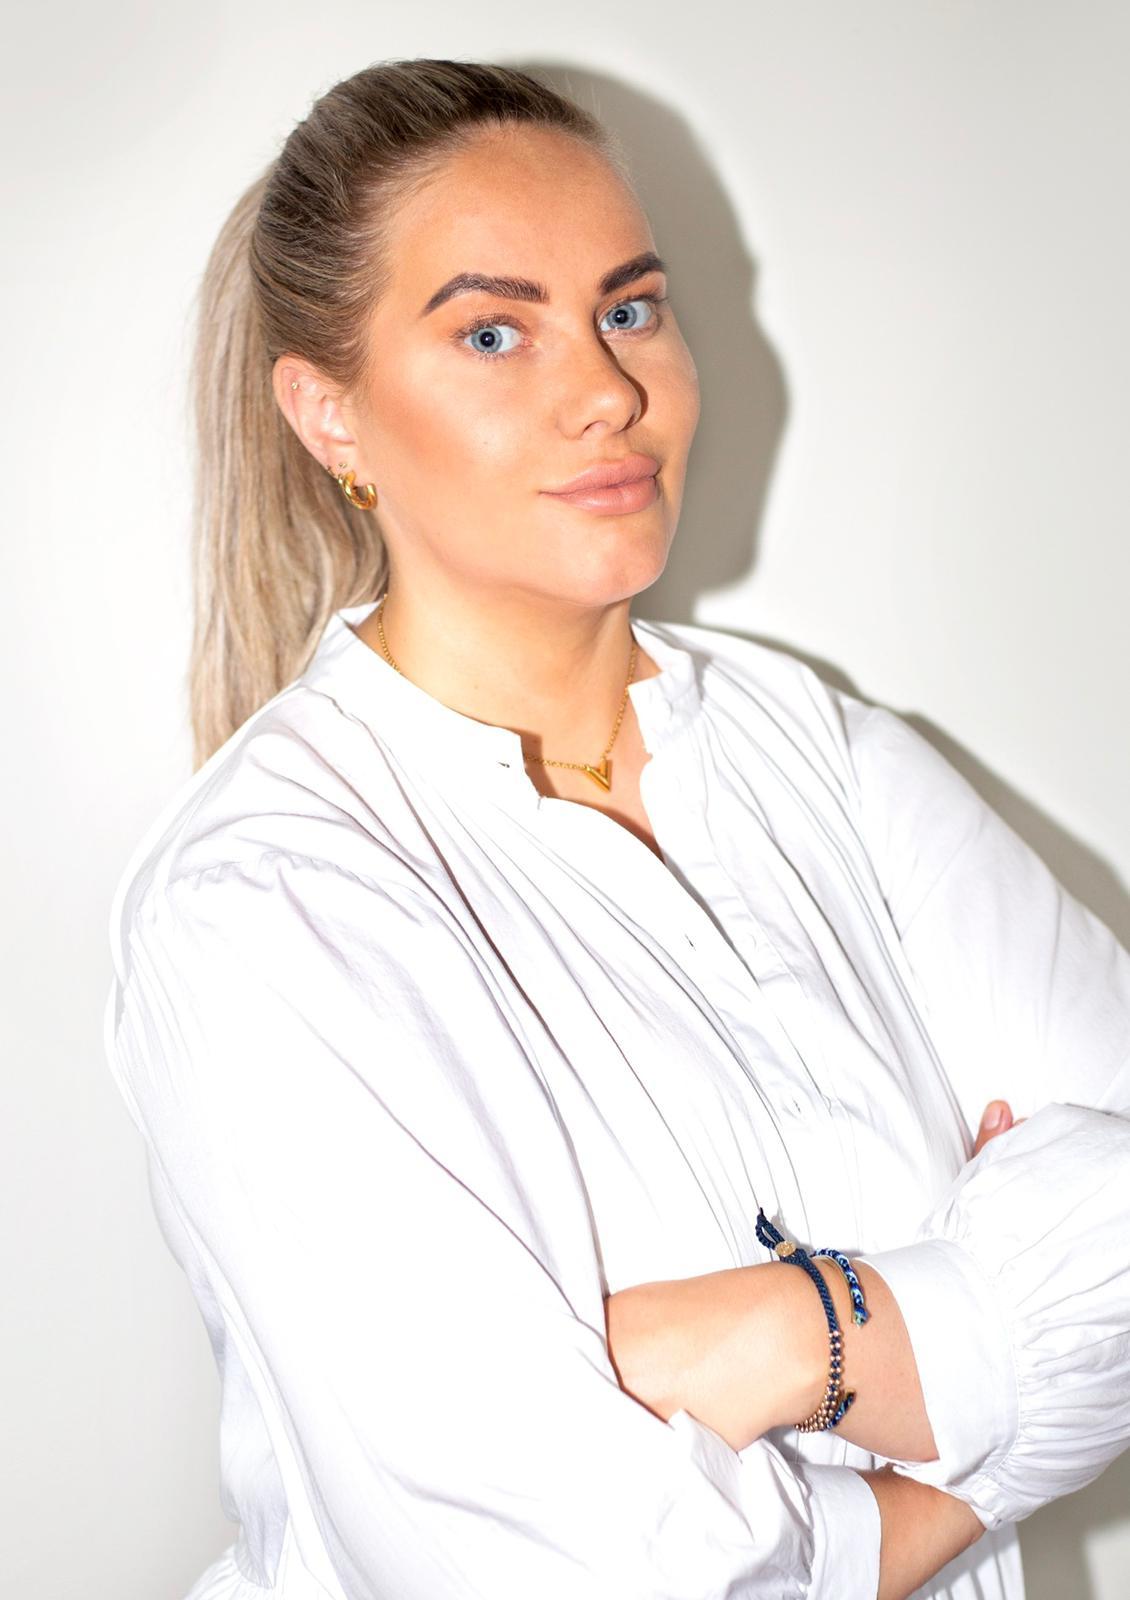 Office manager Eline Marinus